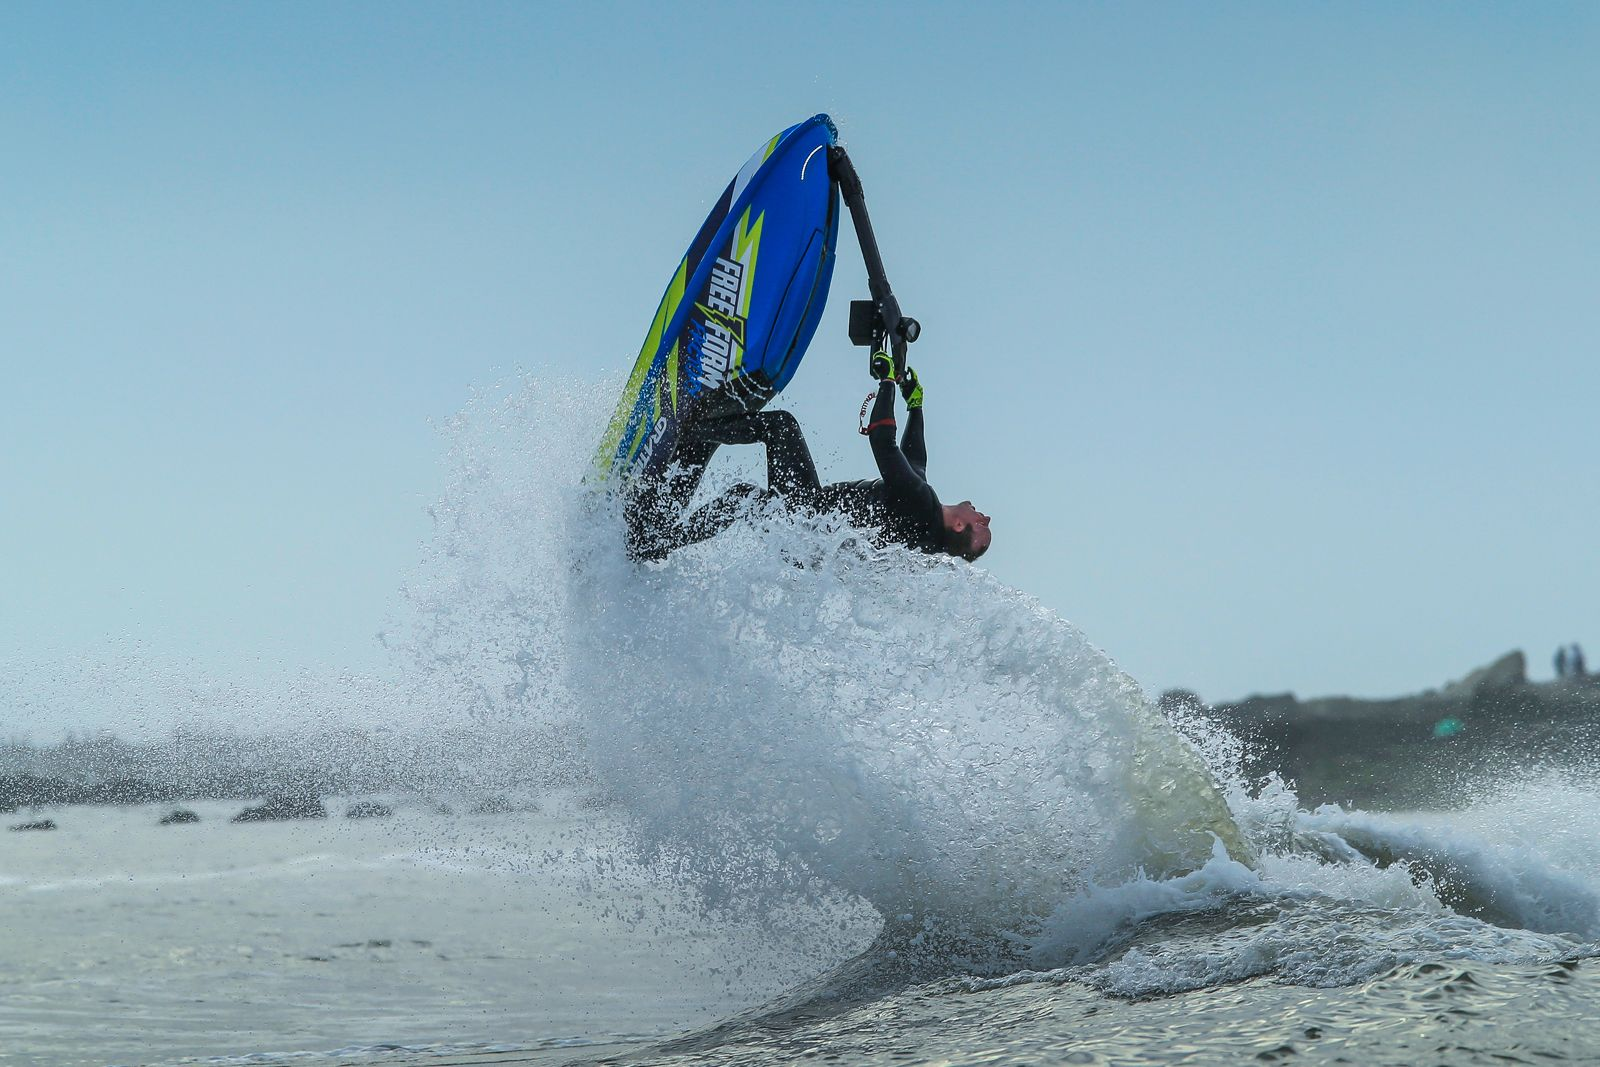 Electric Jet Ski Promises Eco Friendly Watersports Eco Friendly Cleaning Products Eco Friendly Companies Eco Friendly